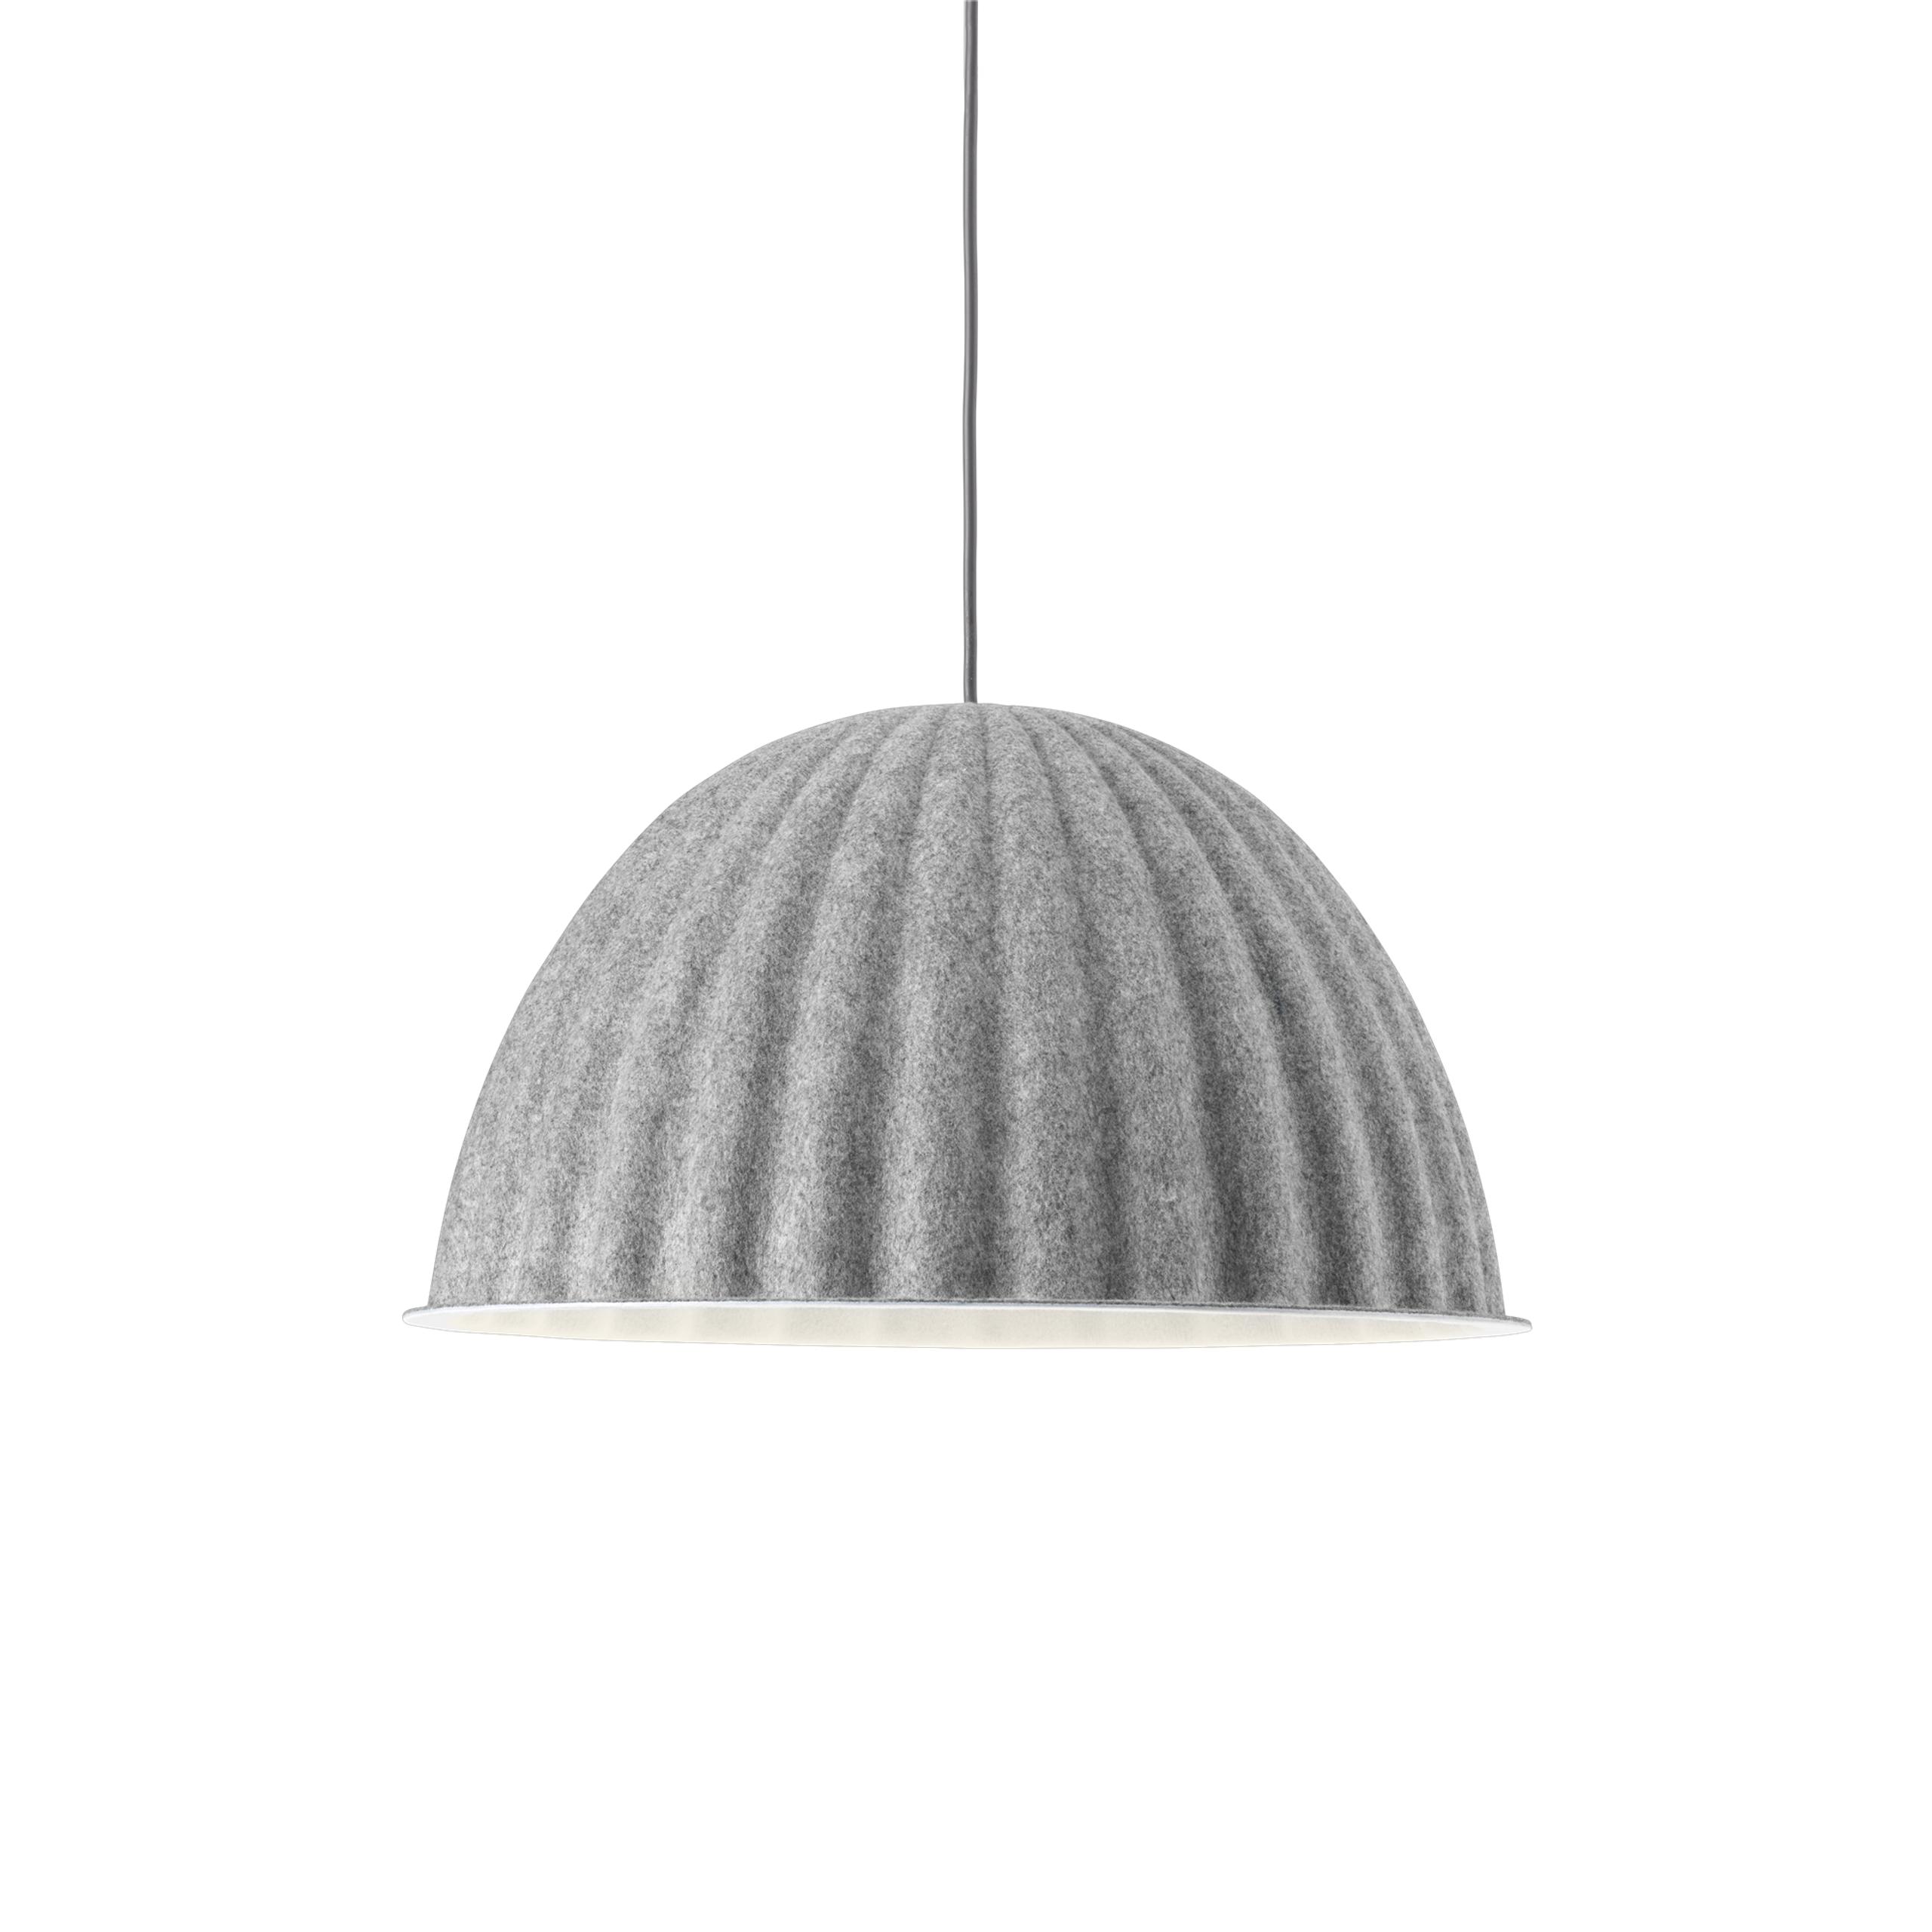 Topnotch Under The Bell Pendant Lamp - Lamp - Muuto SZ-39